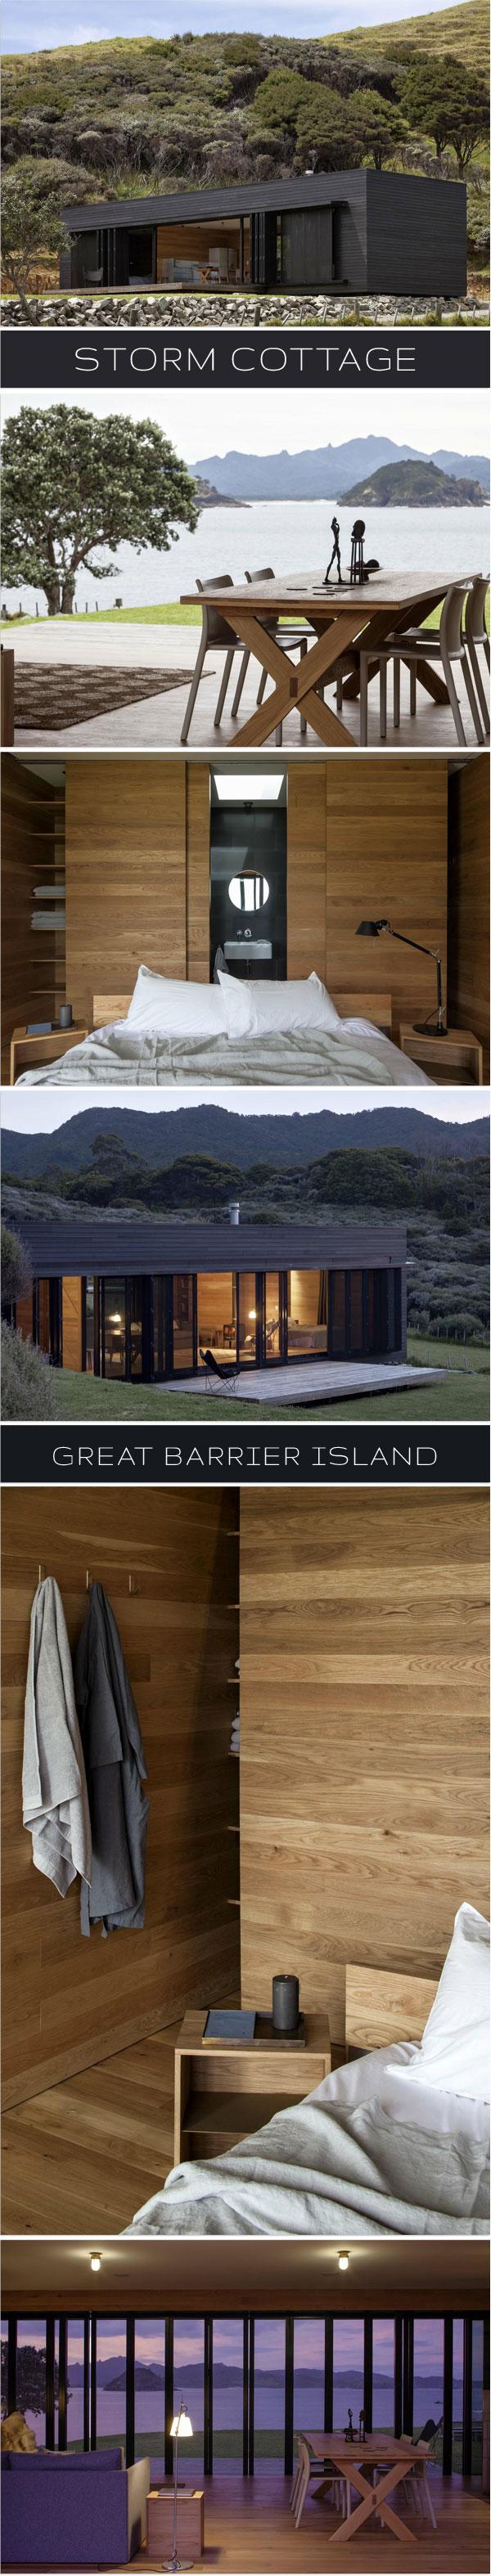 Storm-Cottage-Fearon-Hay-Architects-anManufaktur-